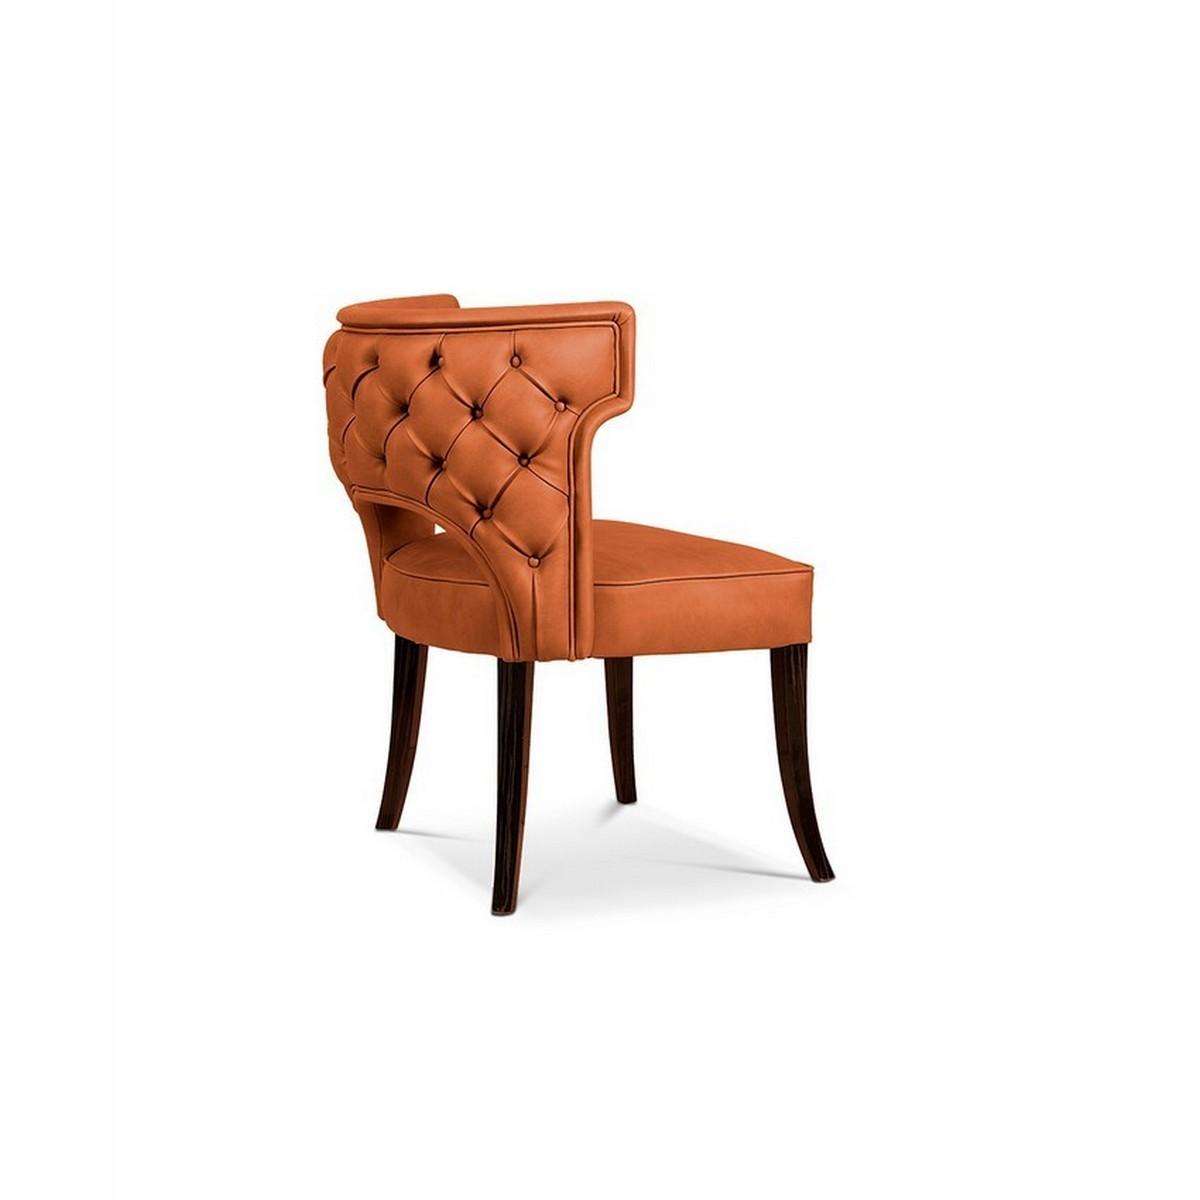 Ideas de Navidad elegantes para 2020 ideas de navidad Ideas de Navidad elegantes para 2020 brabbu kansas dinning chair 4 1200x1200